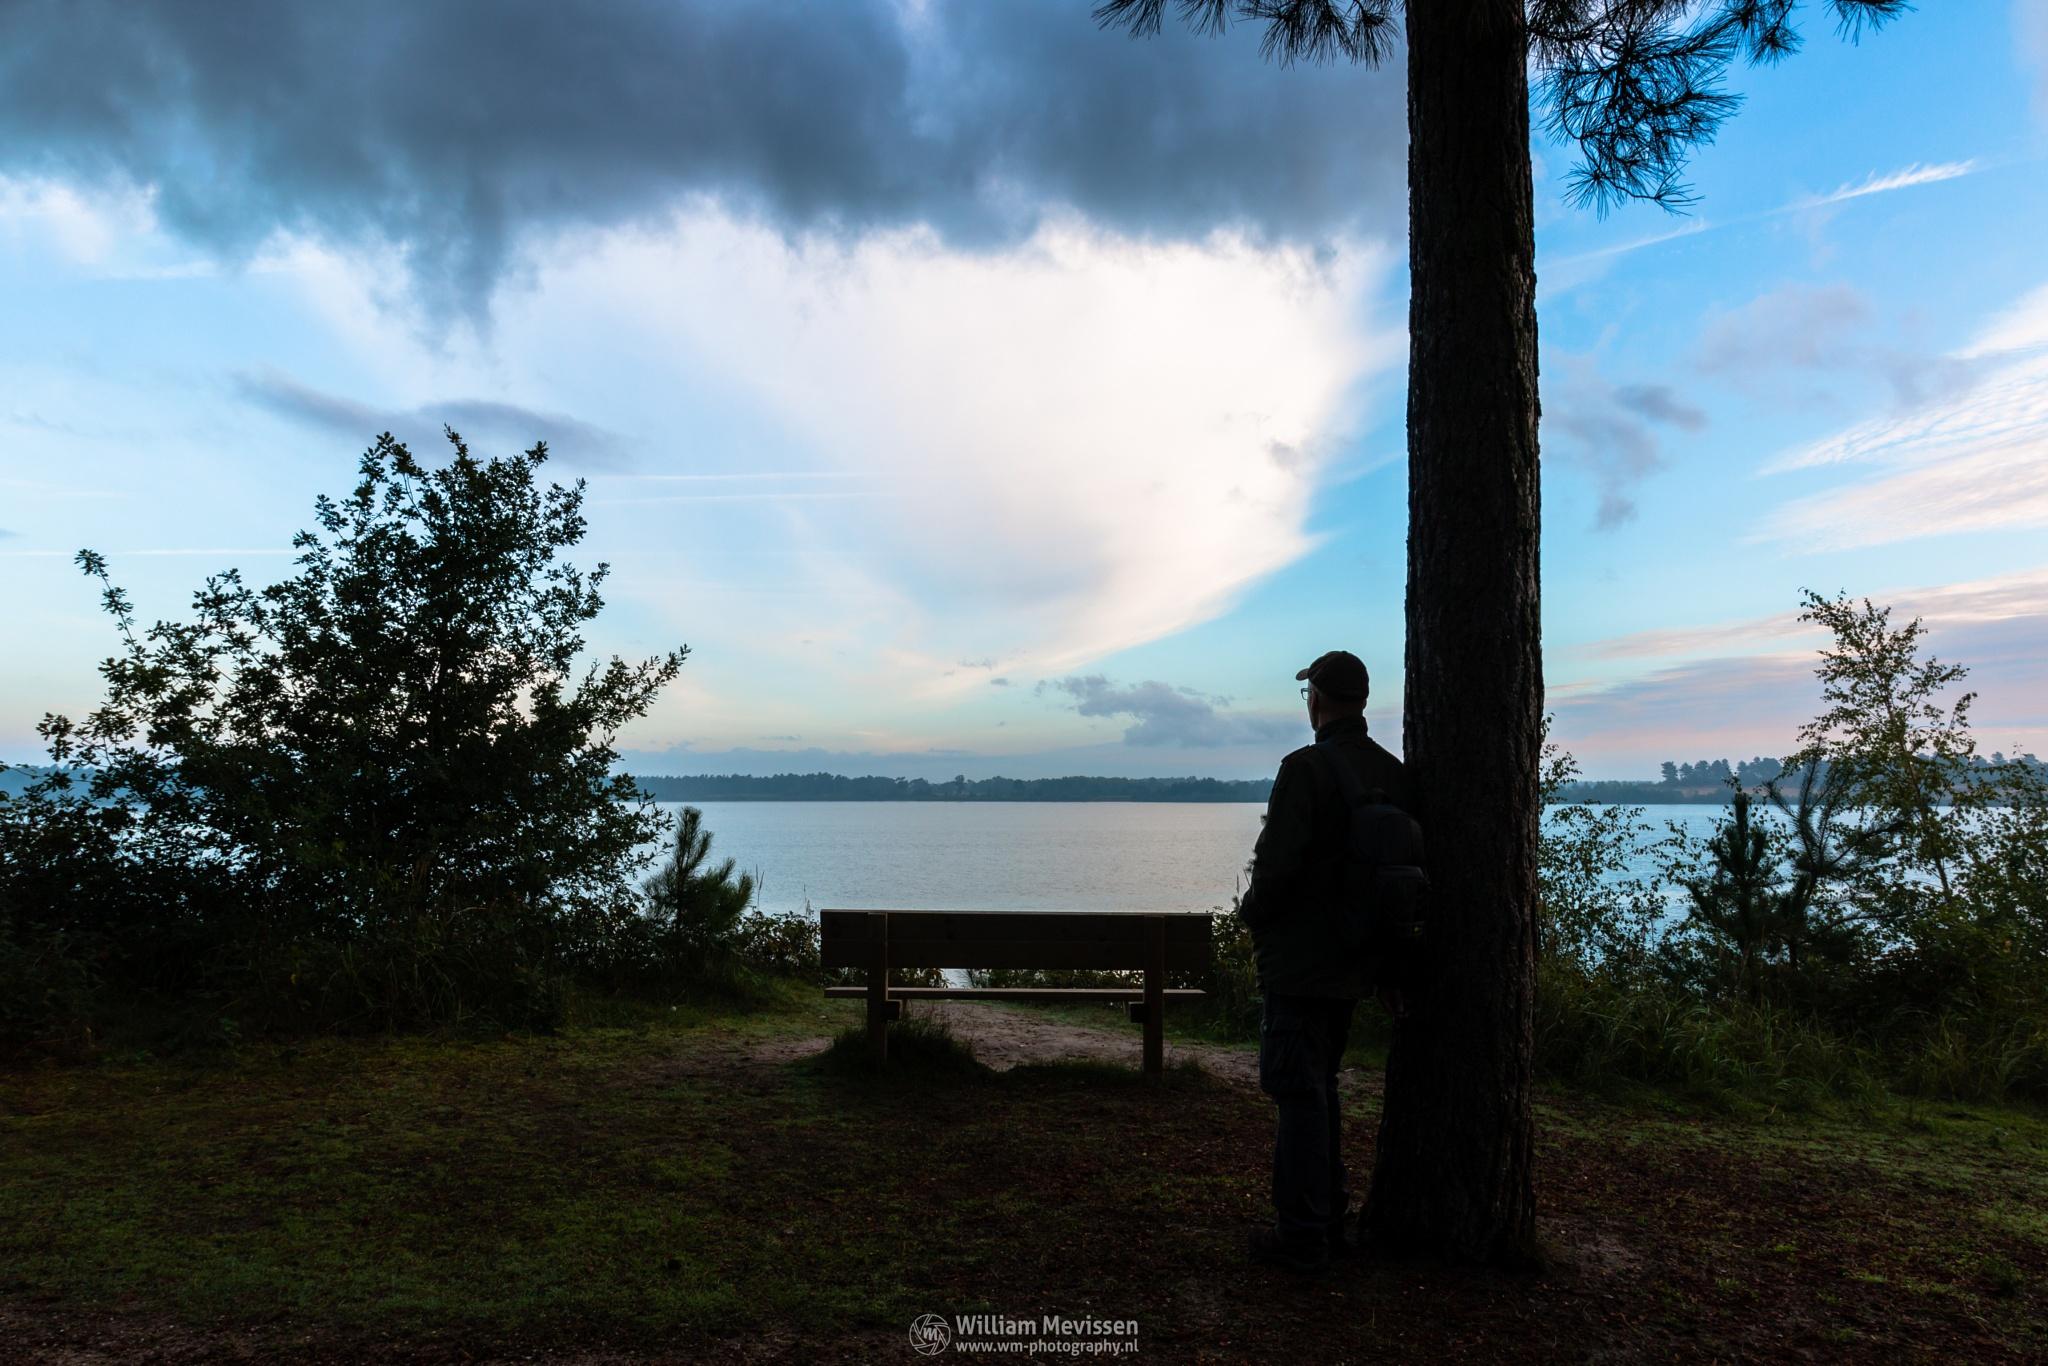 Enjoying The View by William Mevissen